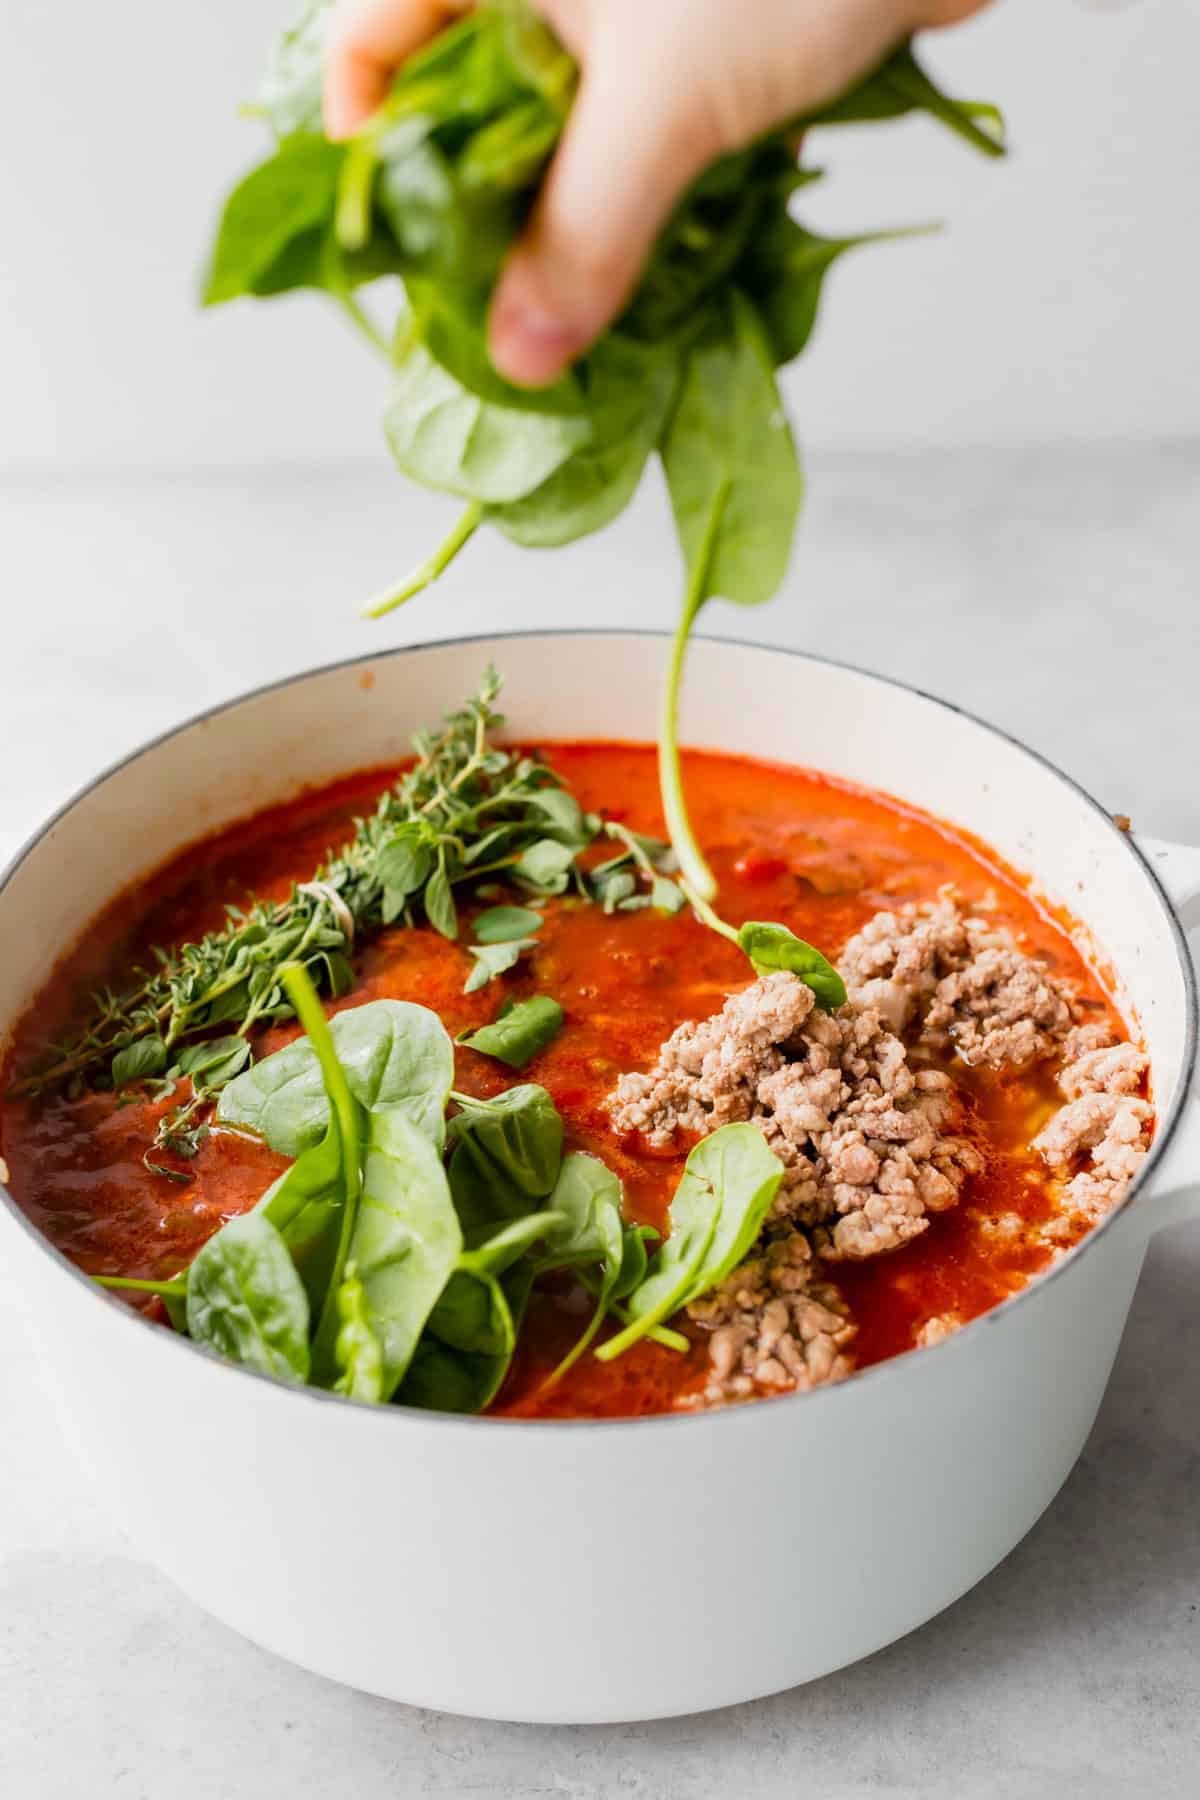 Throwing spinach into lasagna soup.